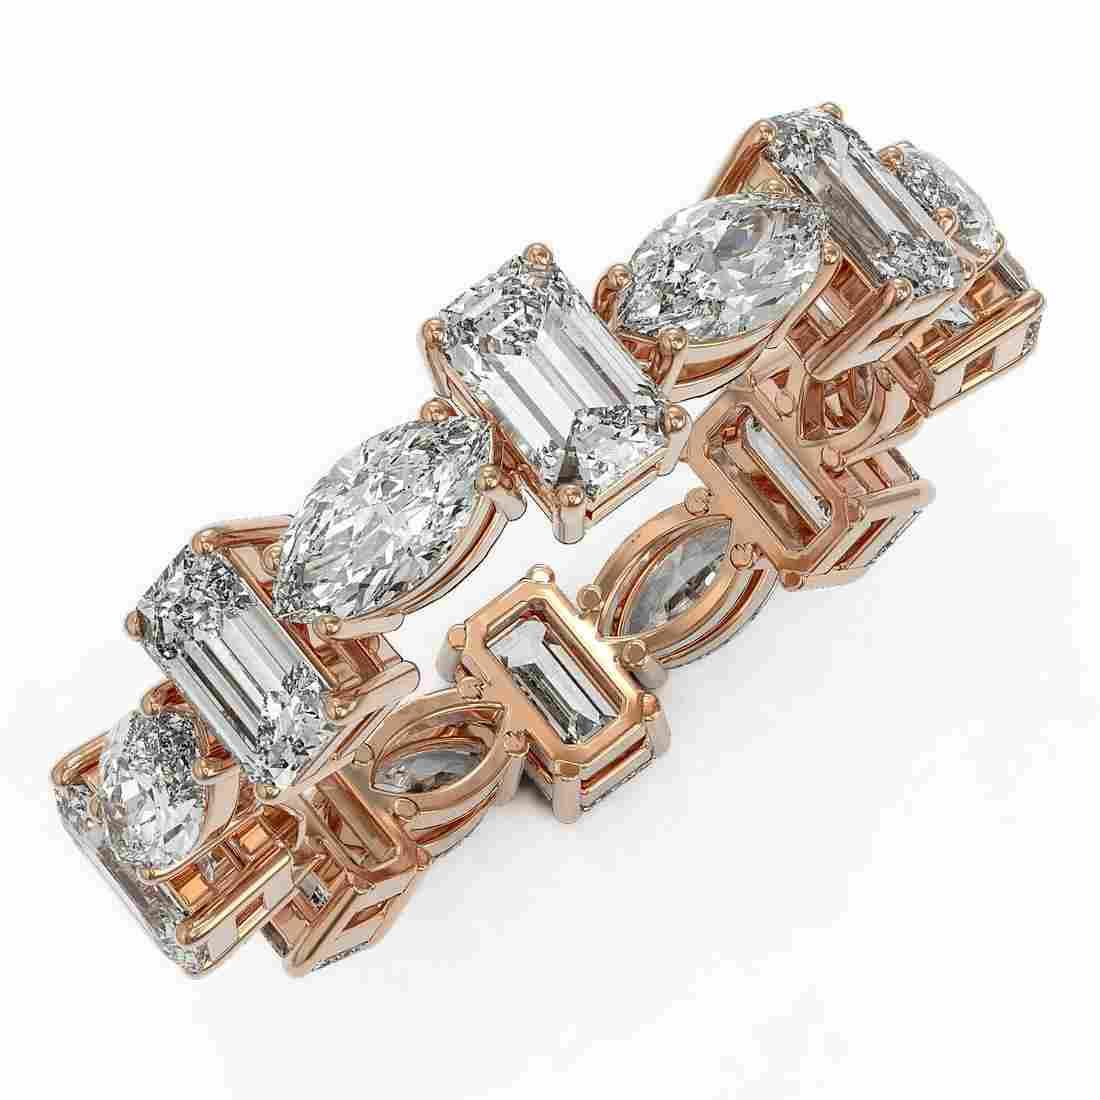 4.16 ctw Emerald Cut Diamond Eternity Ring 18K Rose